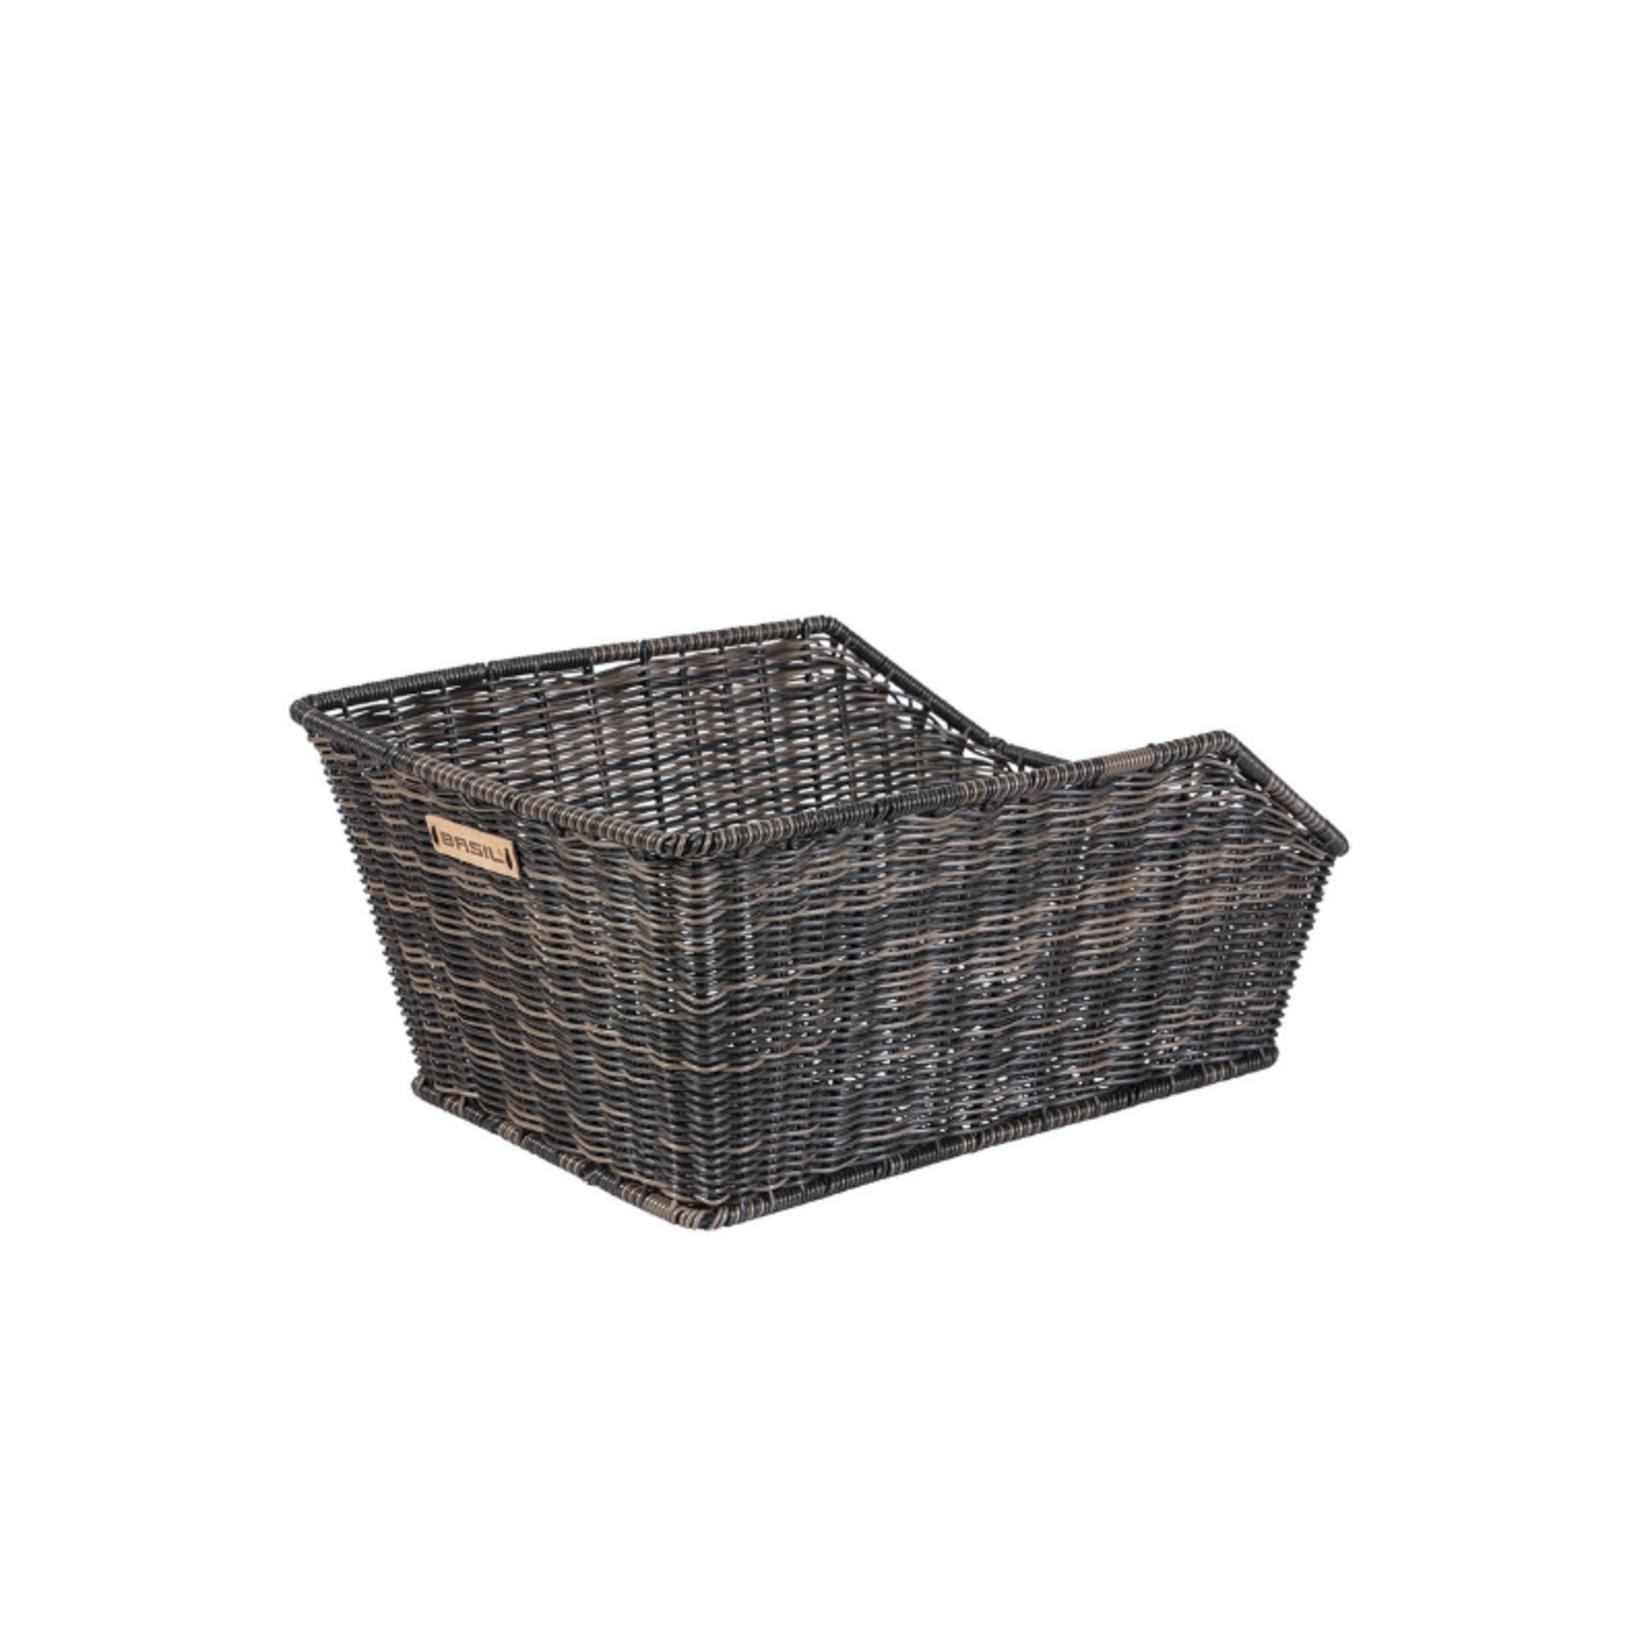 Basil Cento Rear Basket Rattan Look